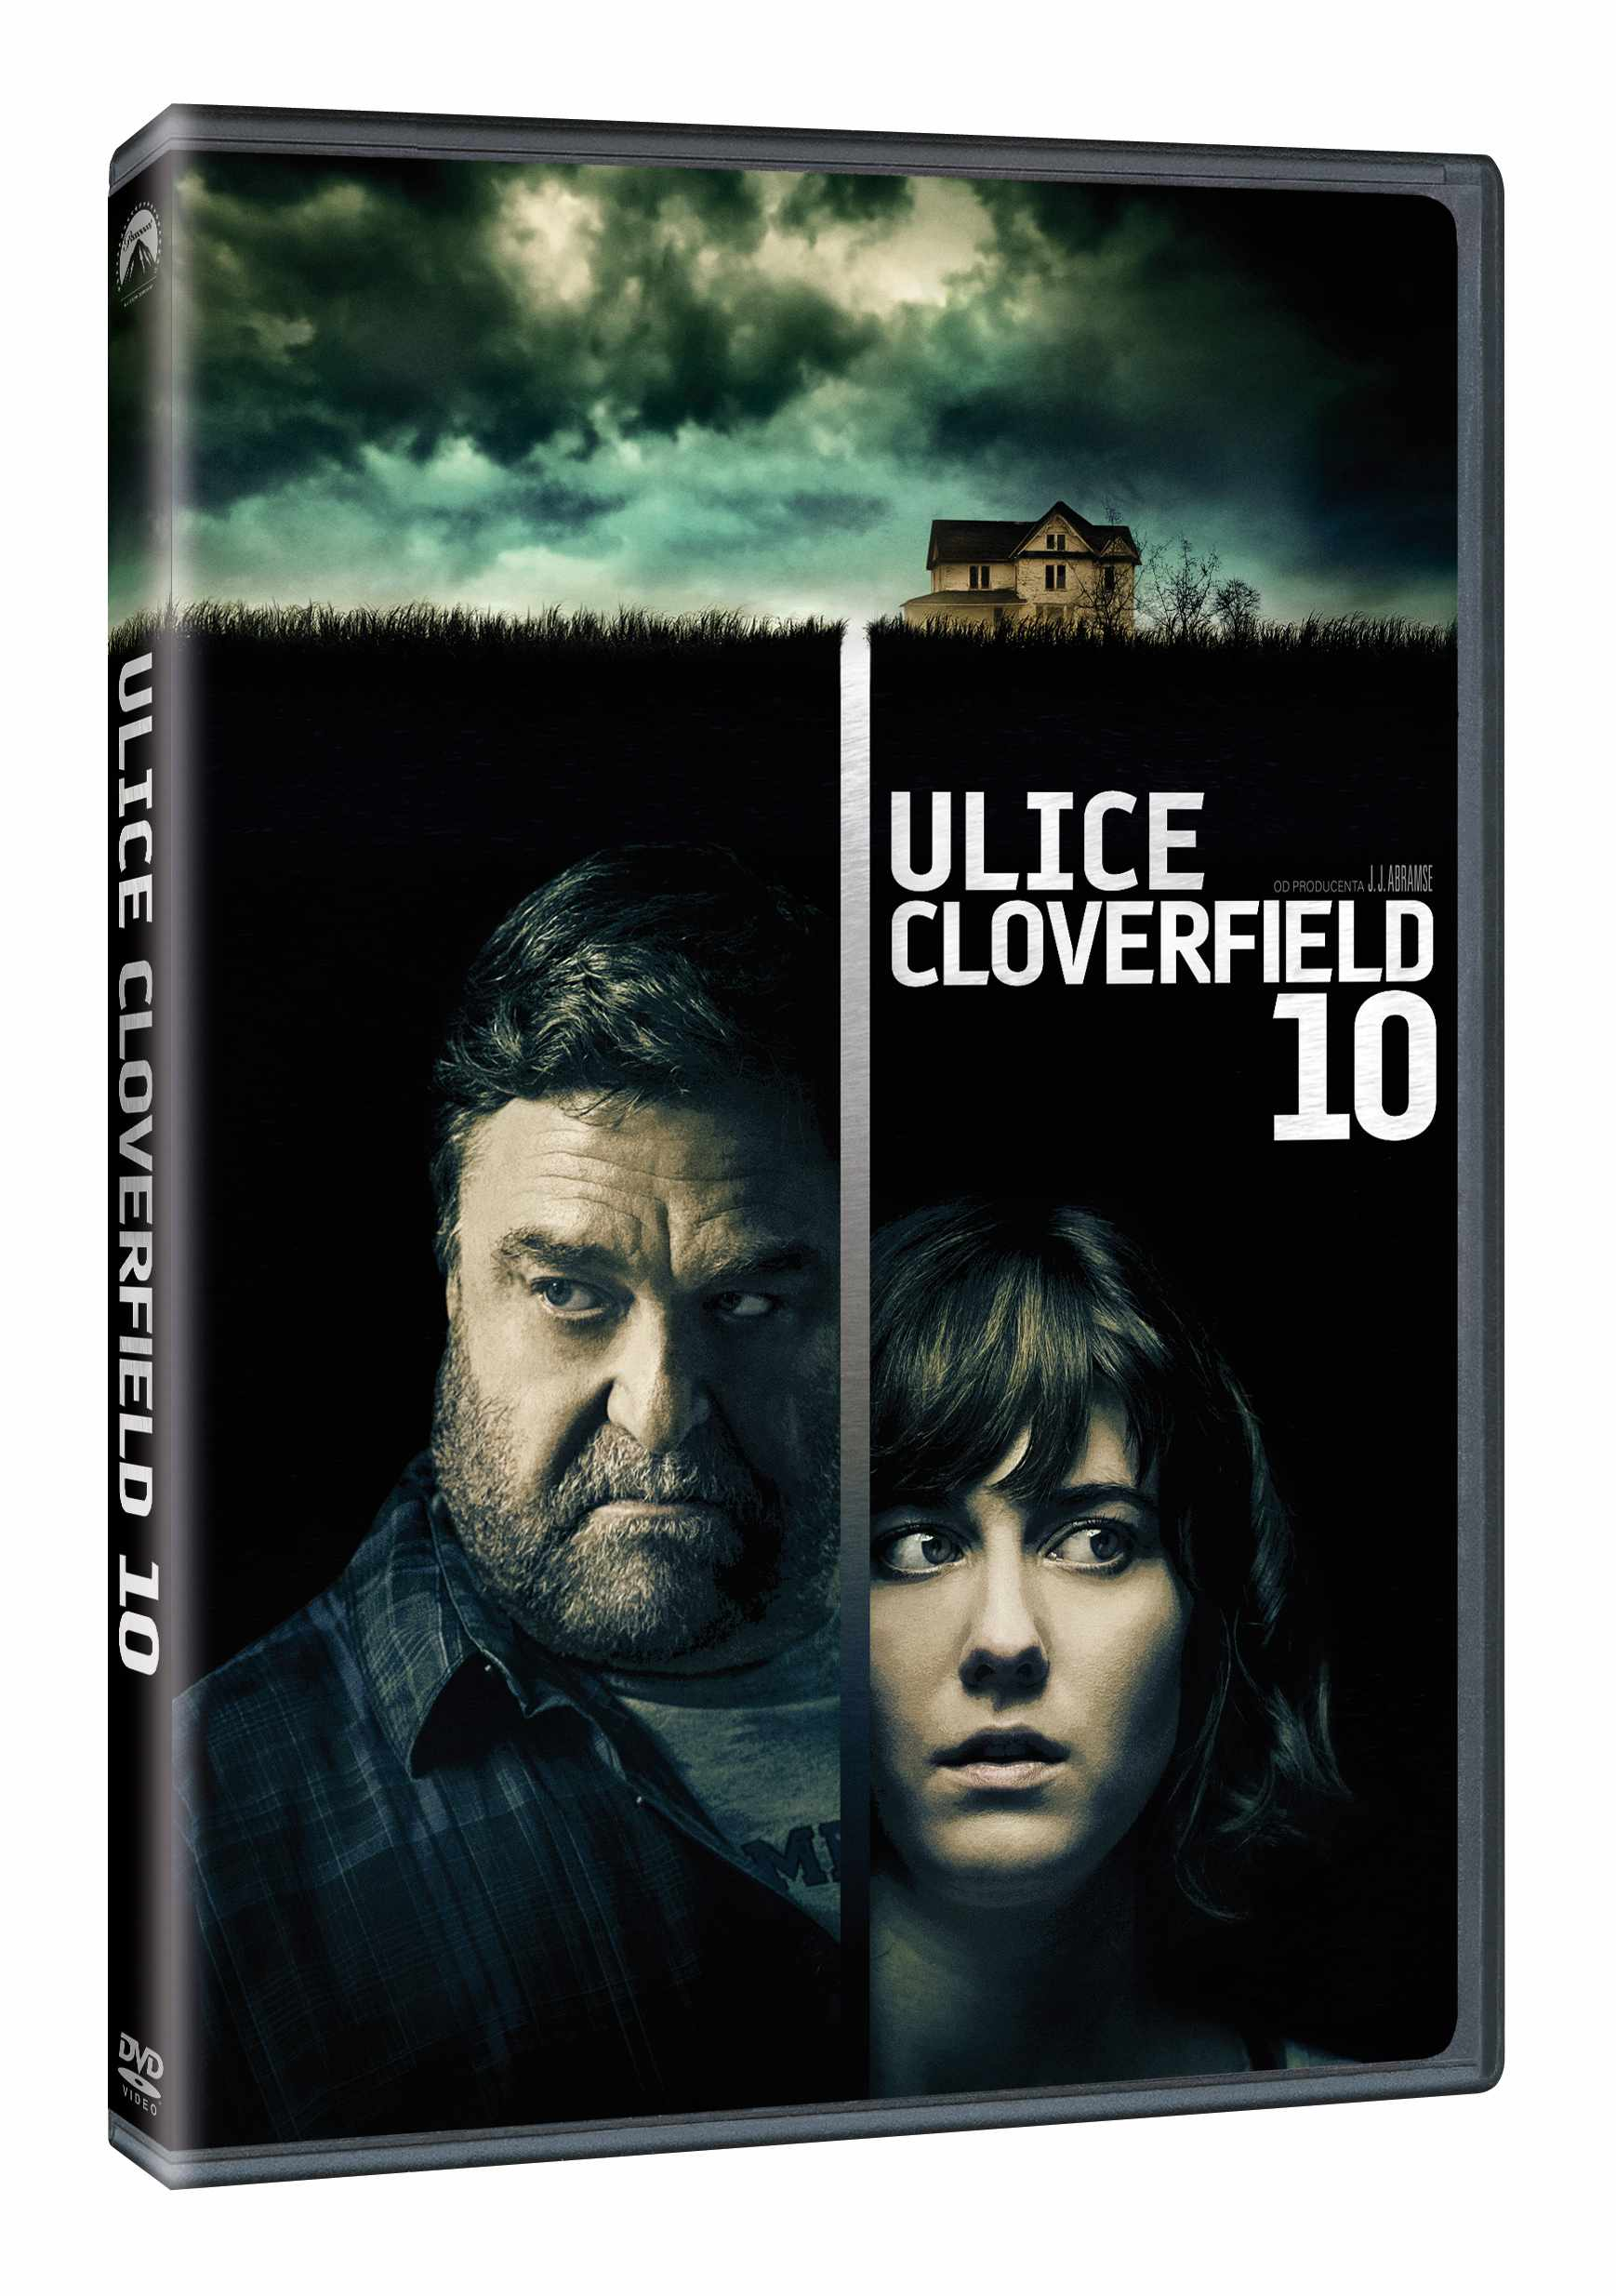 ULICE CLOVERFIELD 10 - DVD